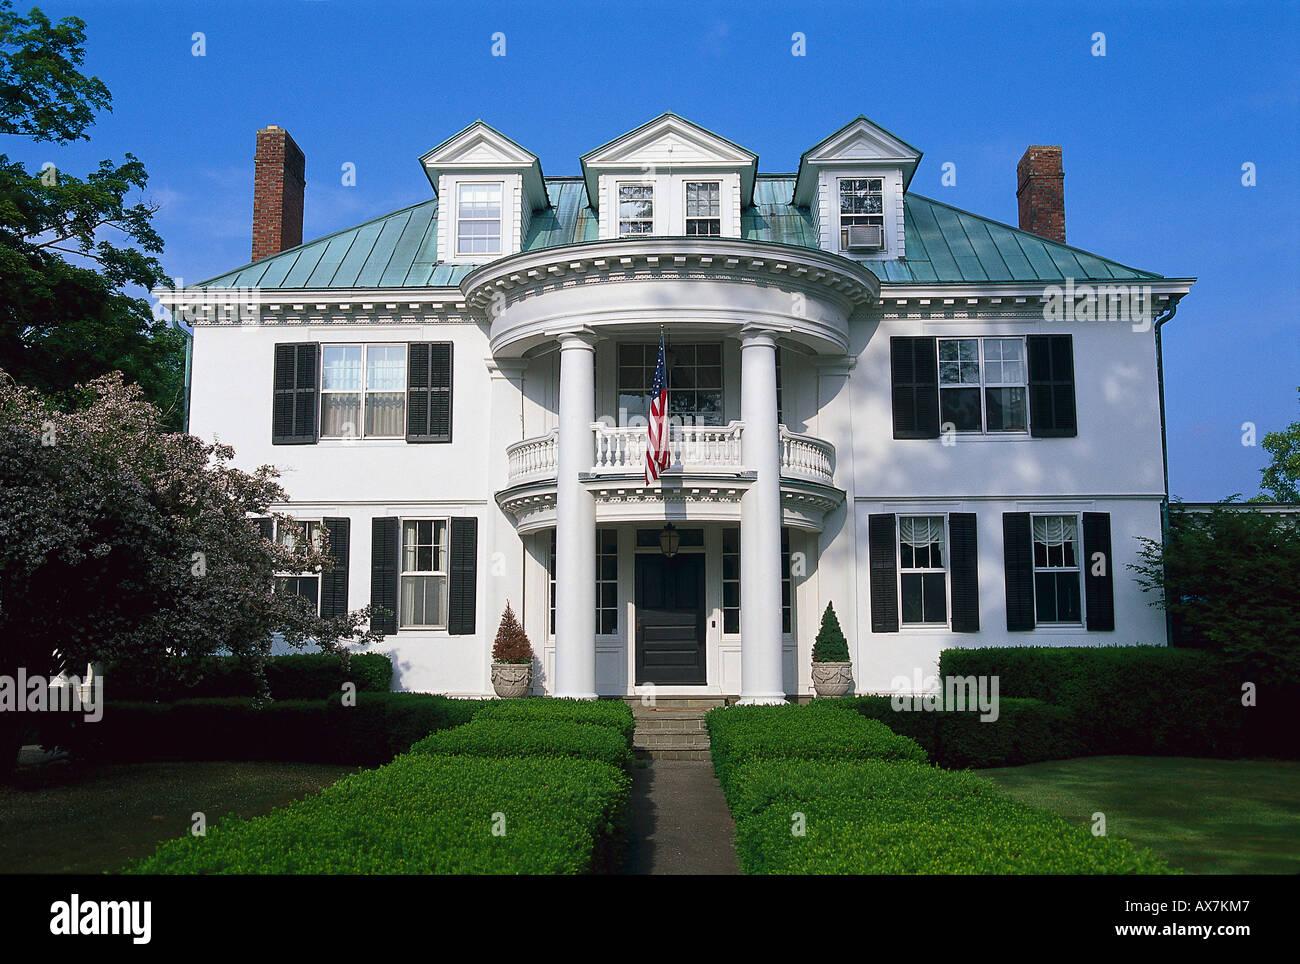 Villen, Downtown, Litchfield Connecticut, USA - Stock Image